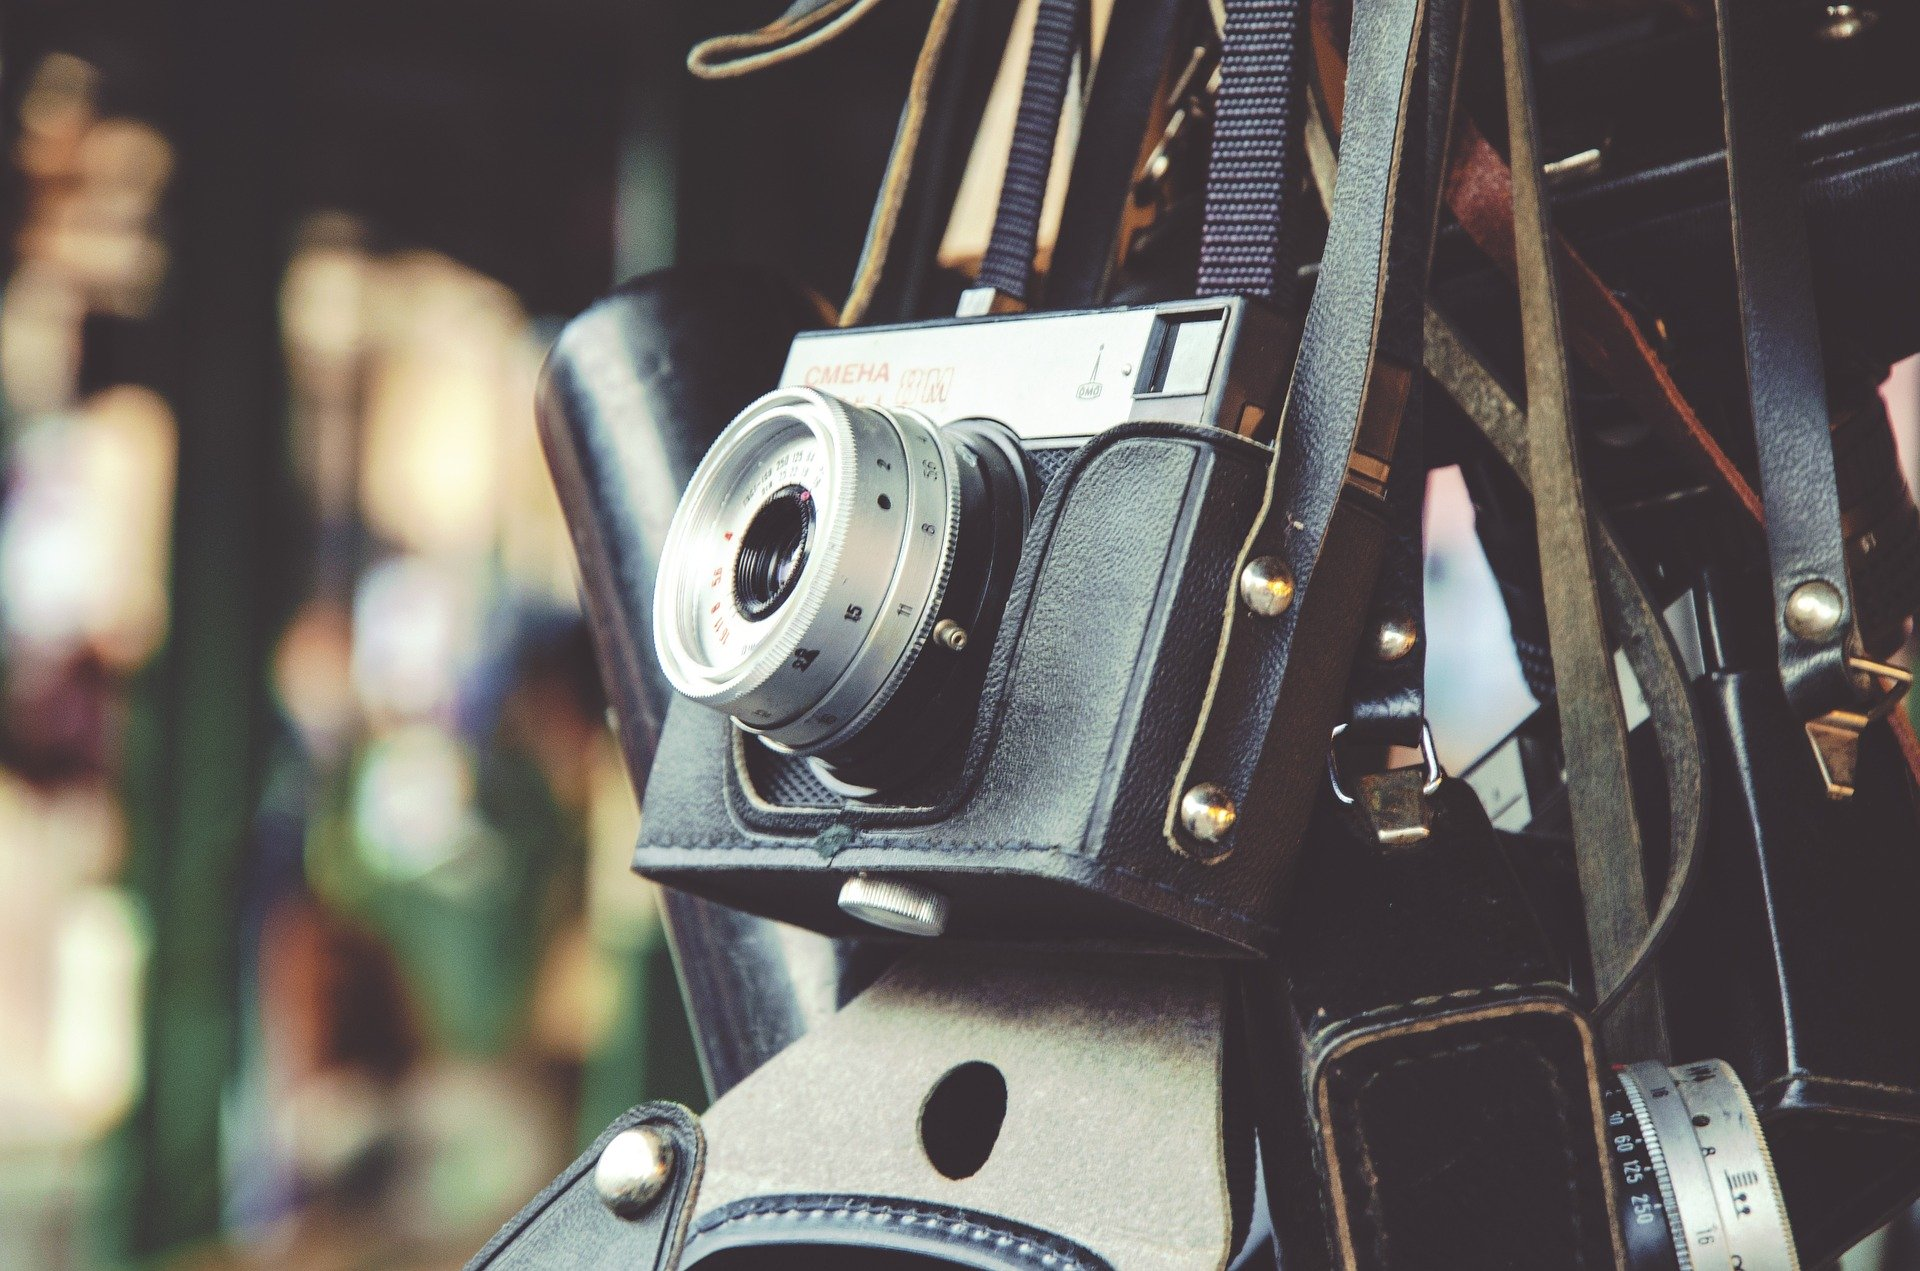 camera-1246655_1920